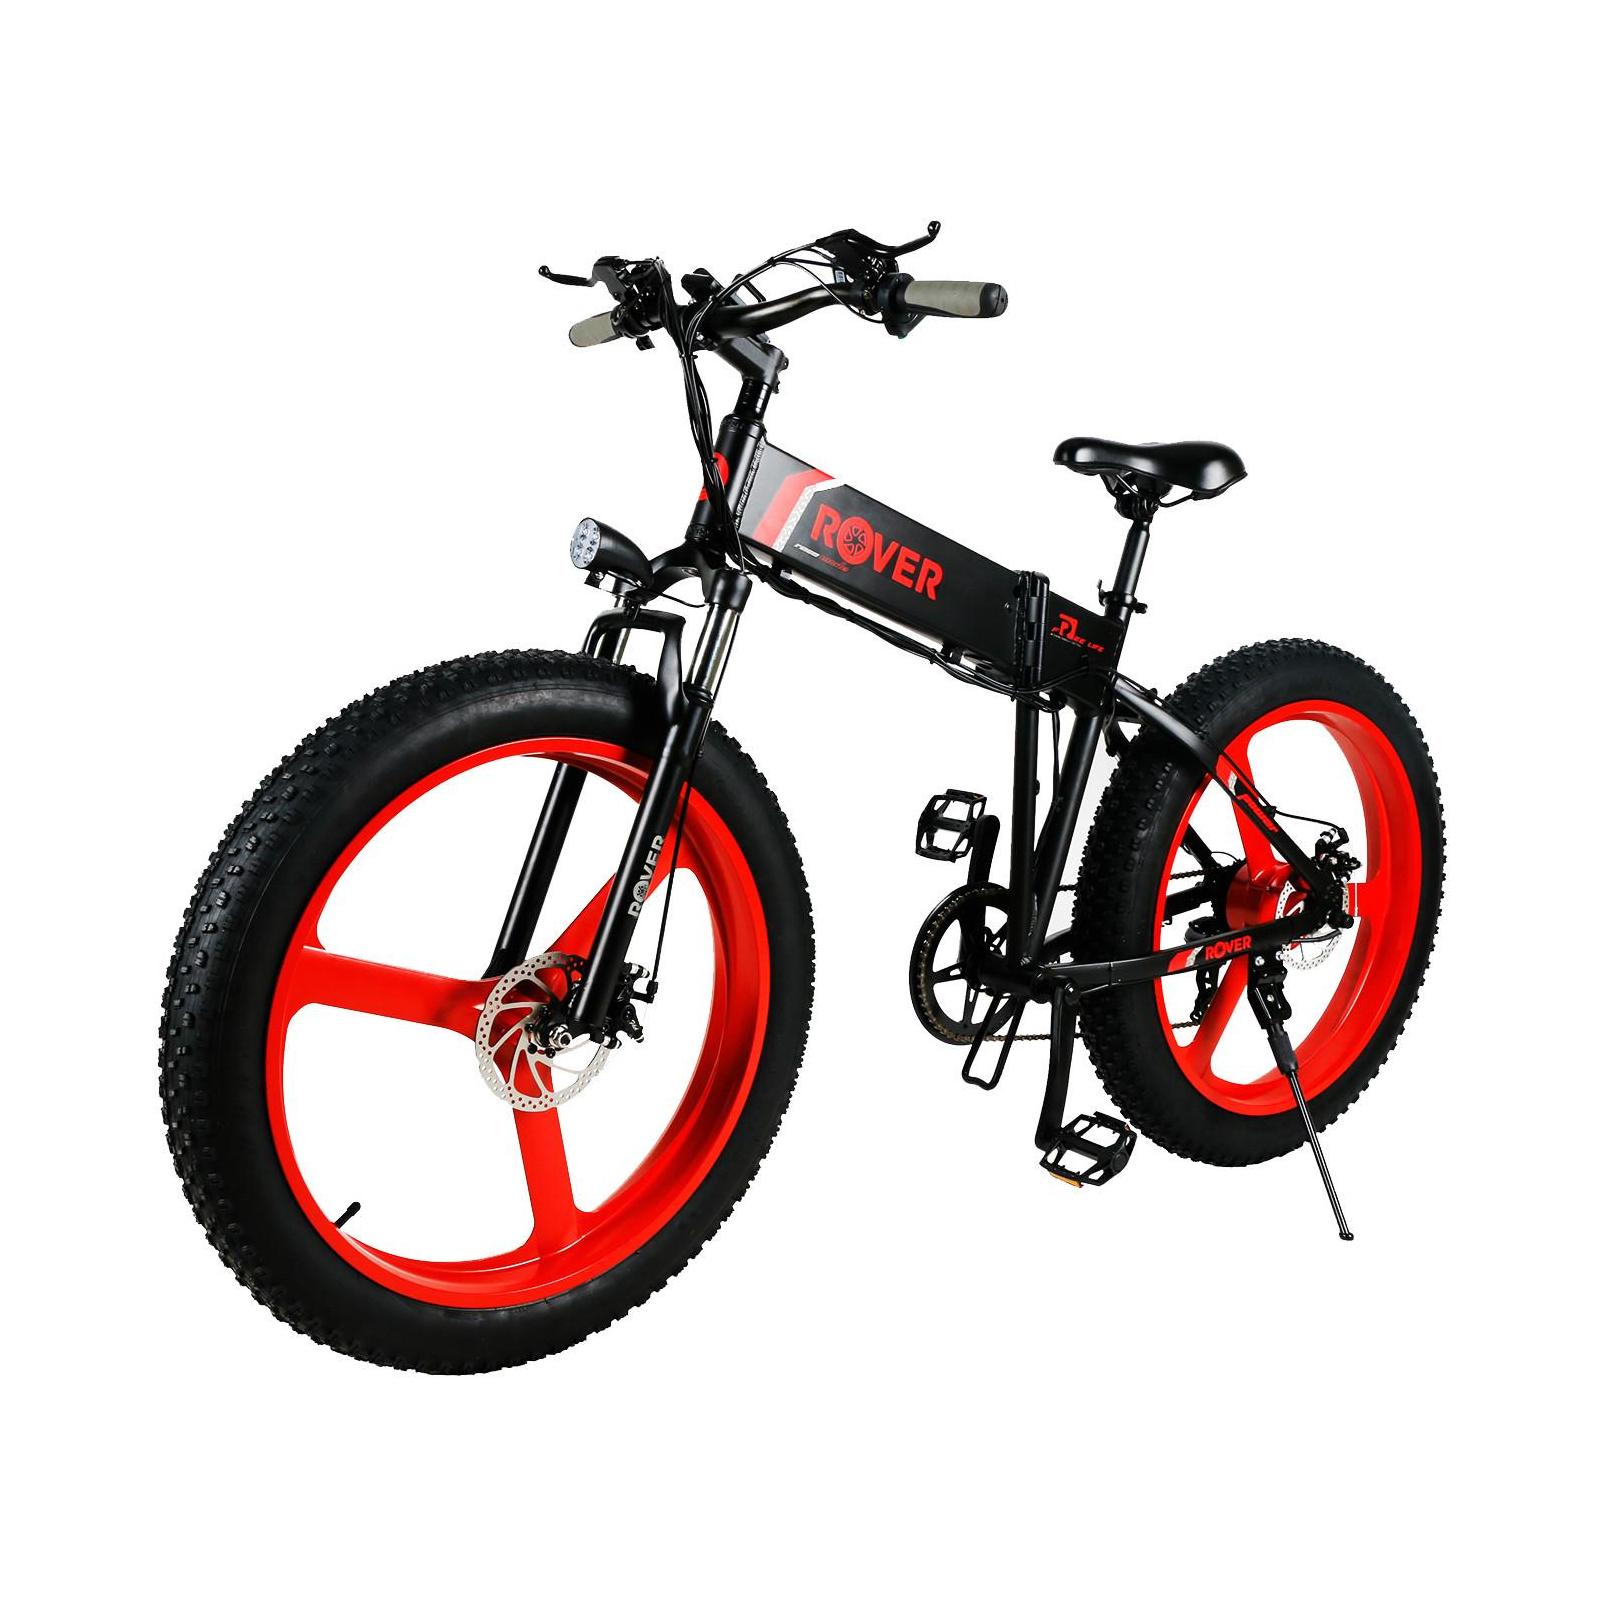 Электровелосипед Rover Monster 1 Spider Red (345271) изображение 2